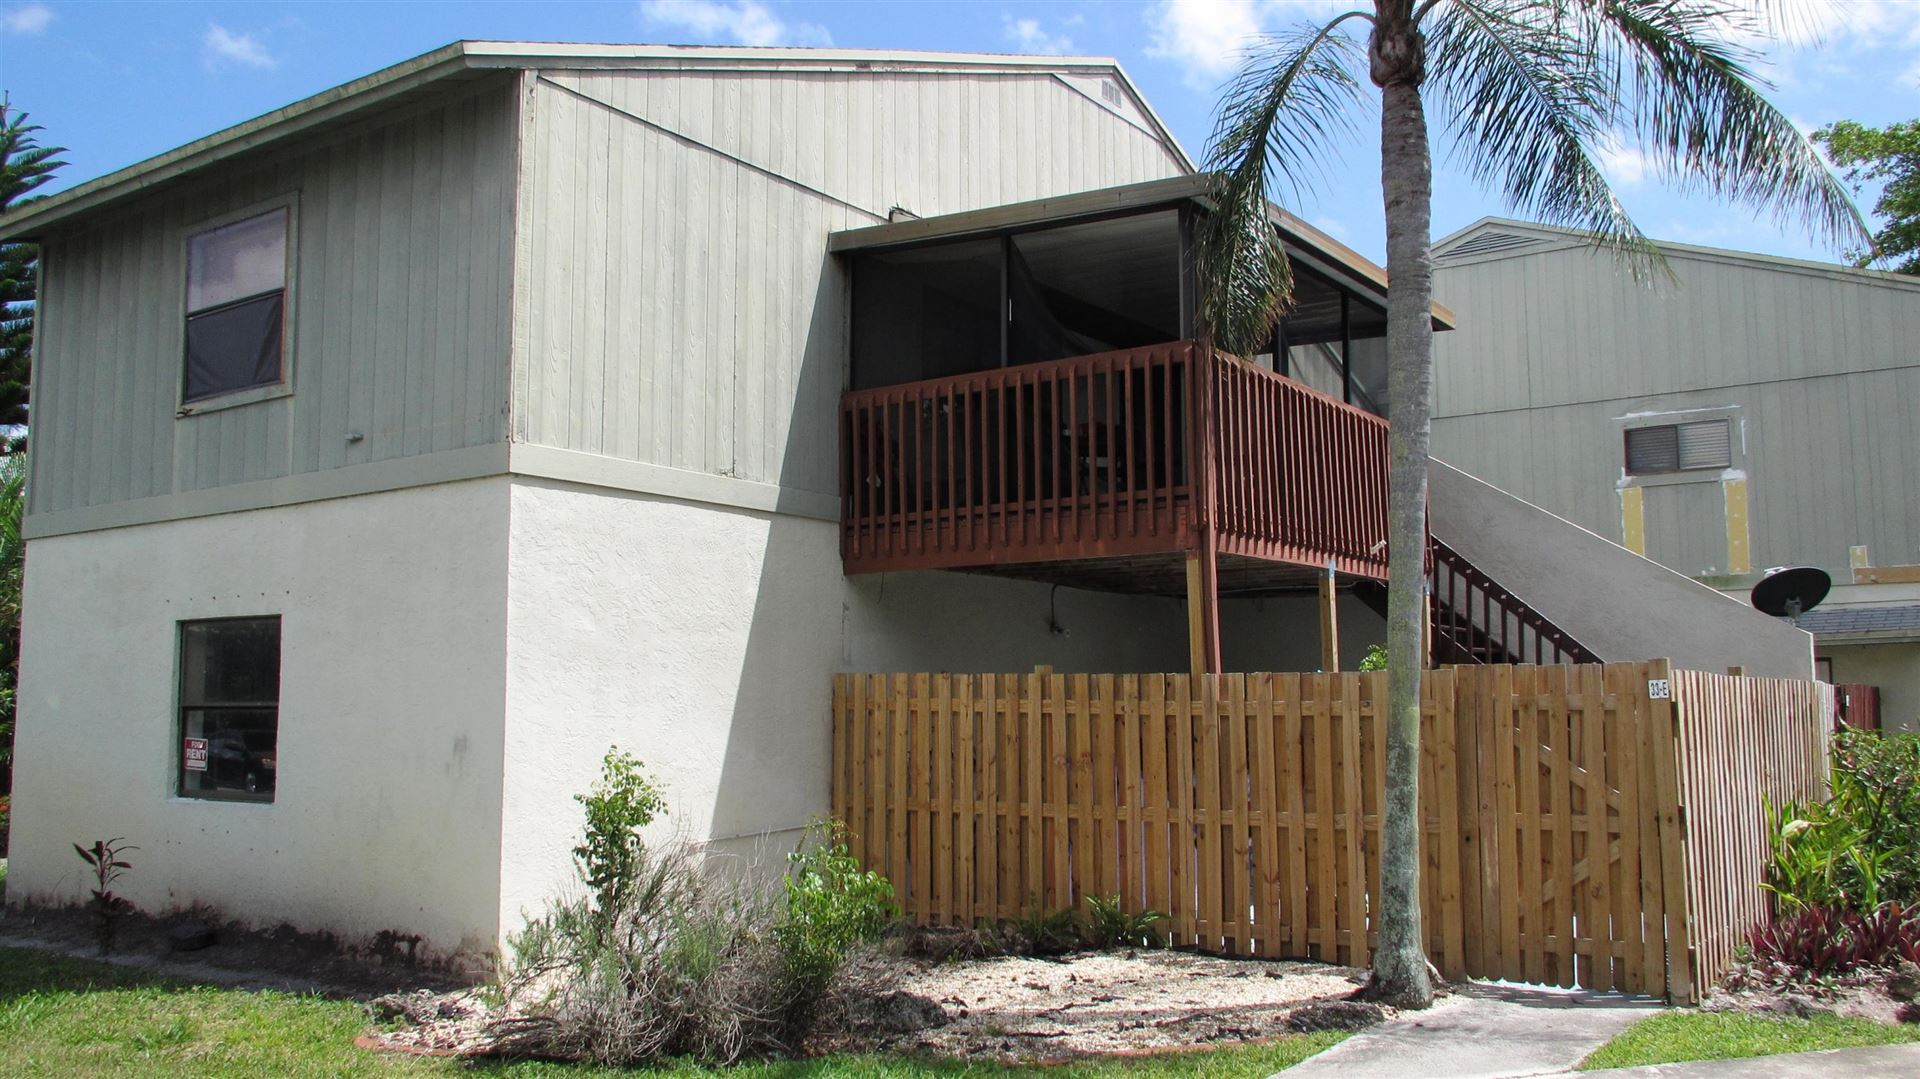 33 Crossings Circle #E, Boynton Beach, FL 33435 - #: RX-10619532